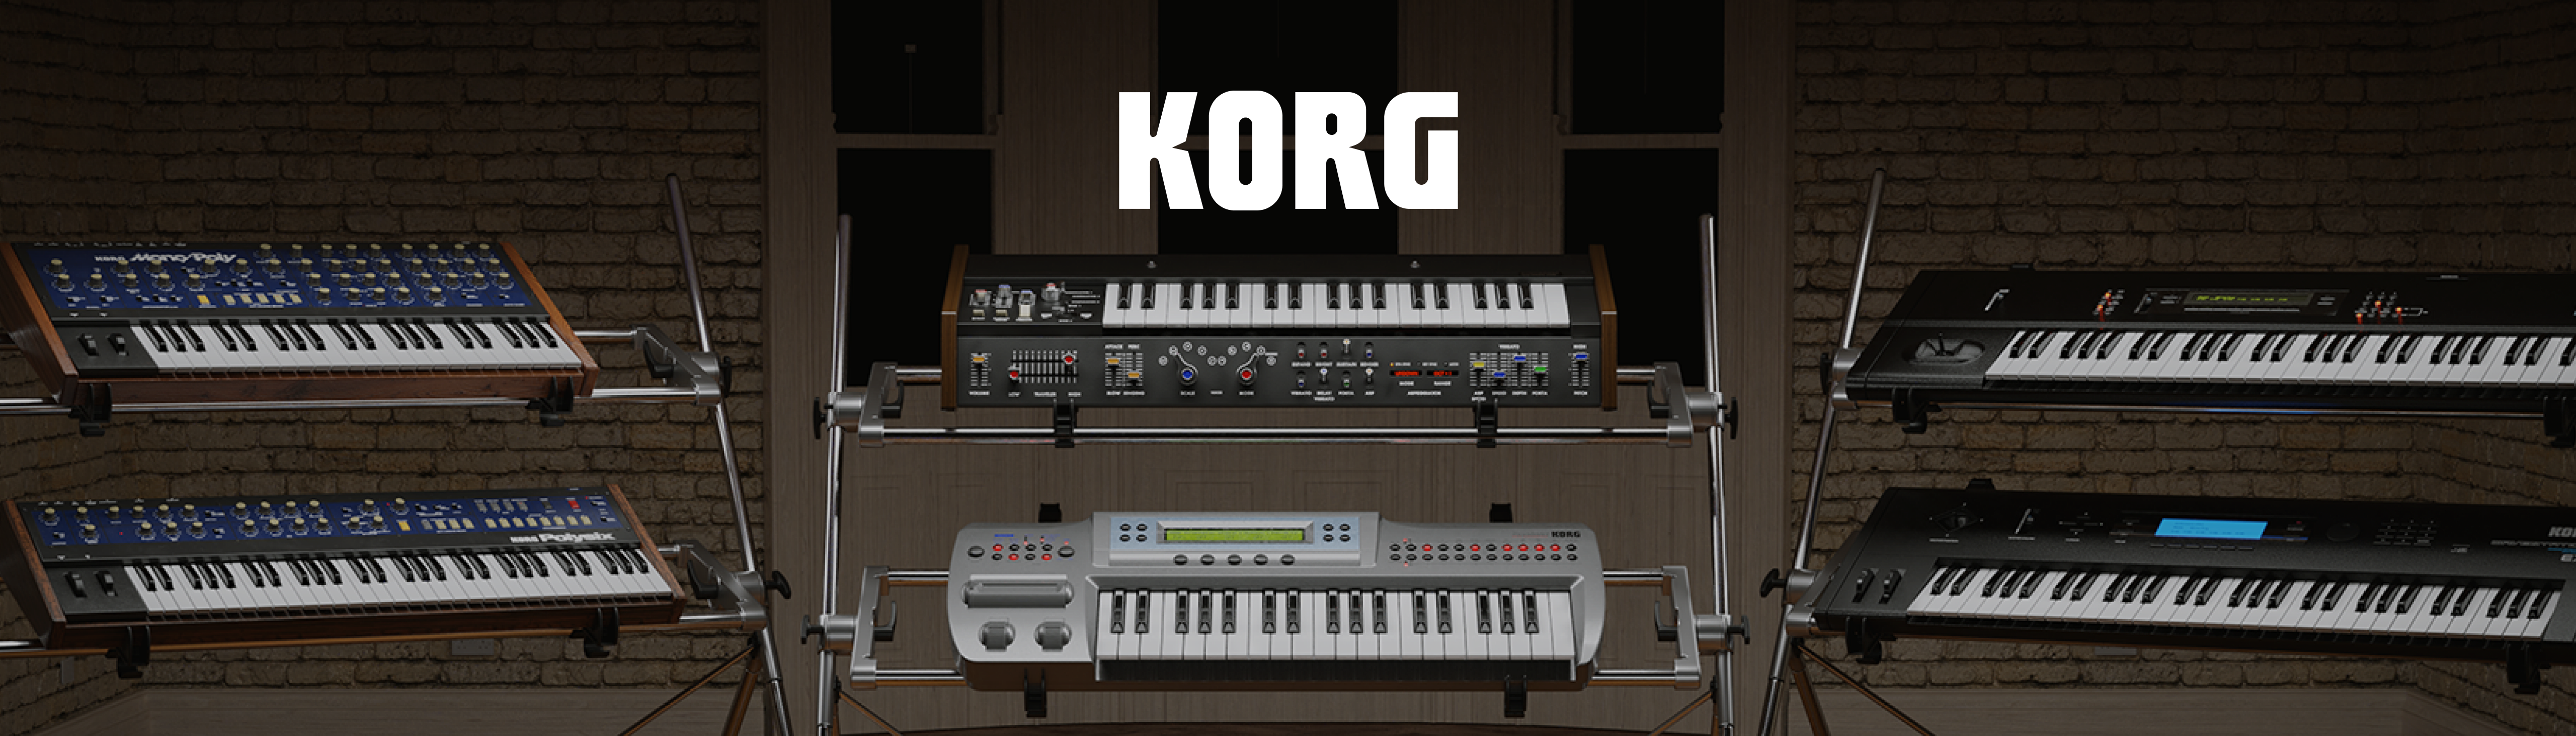 KORG Collection 3 header